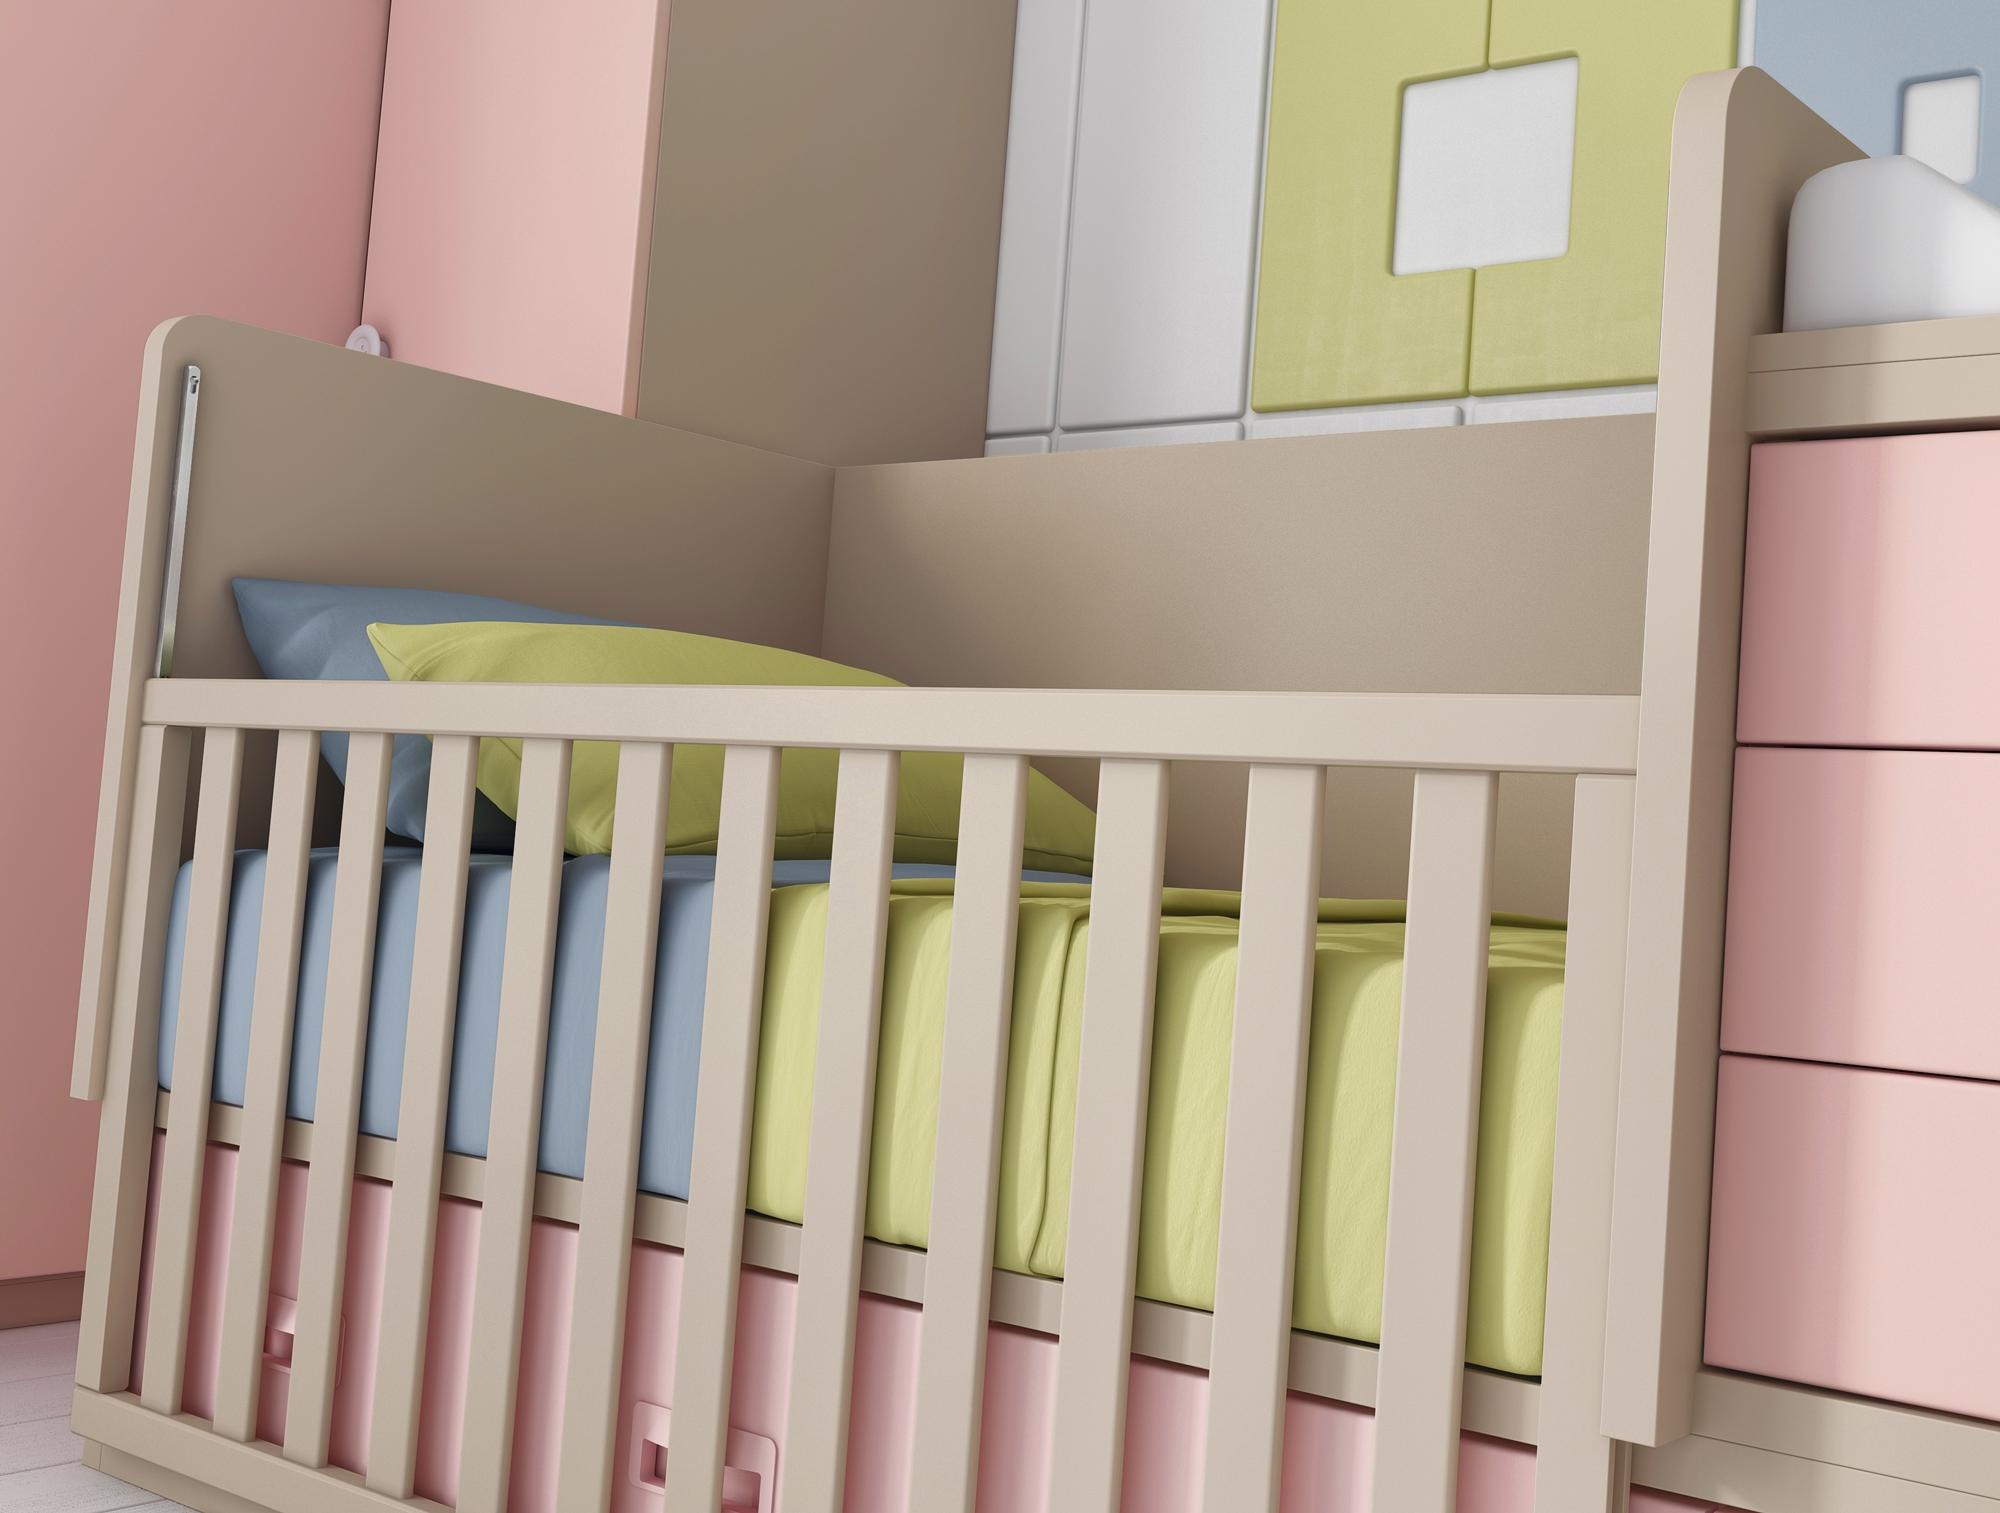 berceau b b fille bc30 lit volutif avec 4 coffres. Black Bedroom Furniture Sets. Home Design Ideas